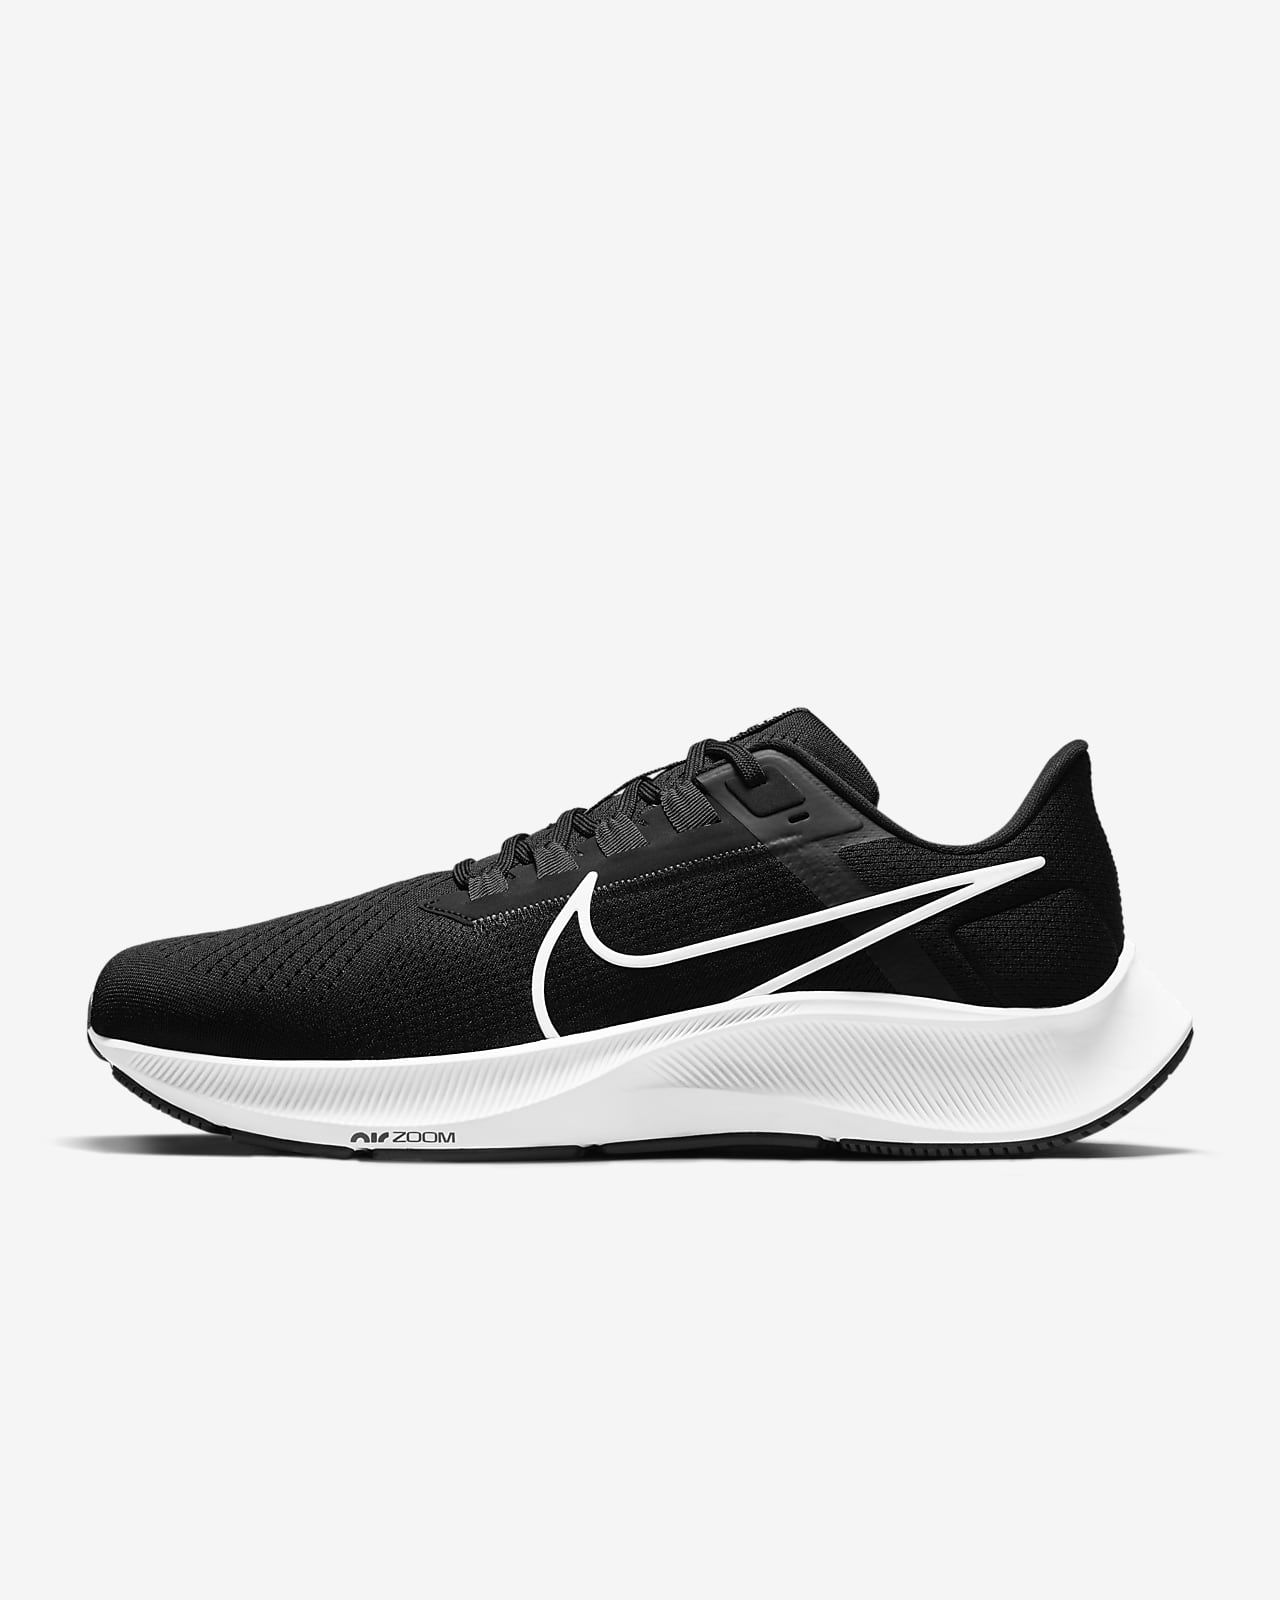 Nike Air Zoom Pegasus 38 Men's Road Running Shoes (Extra Wide)